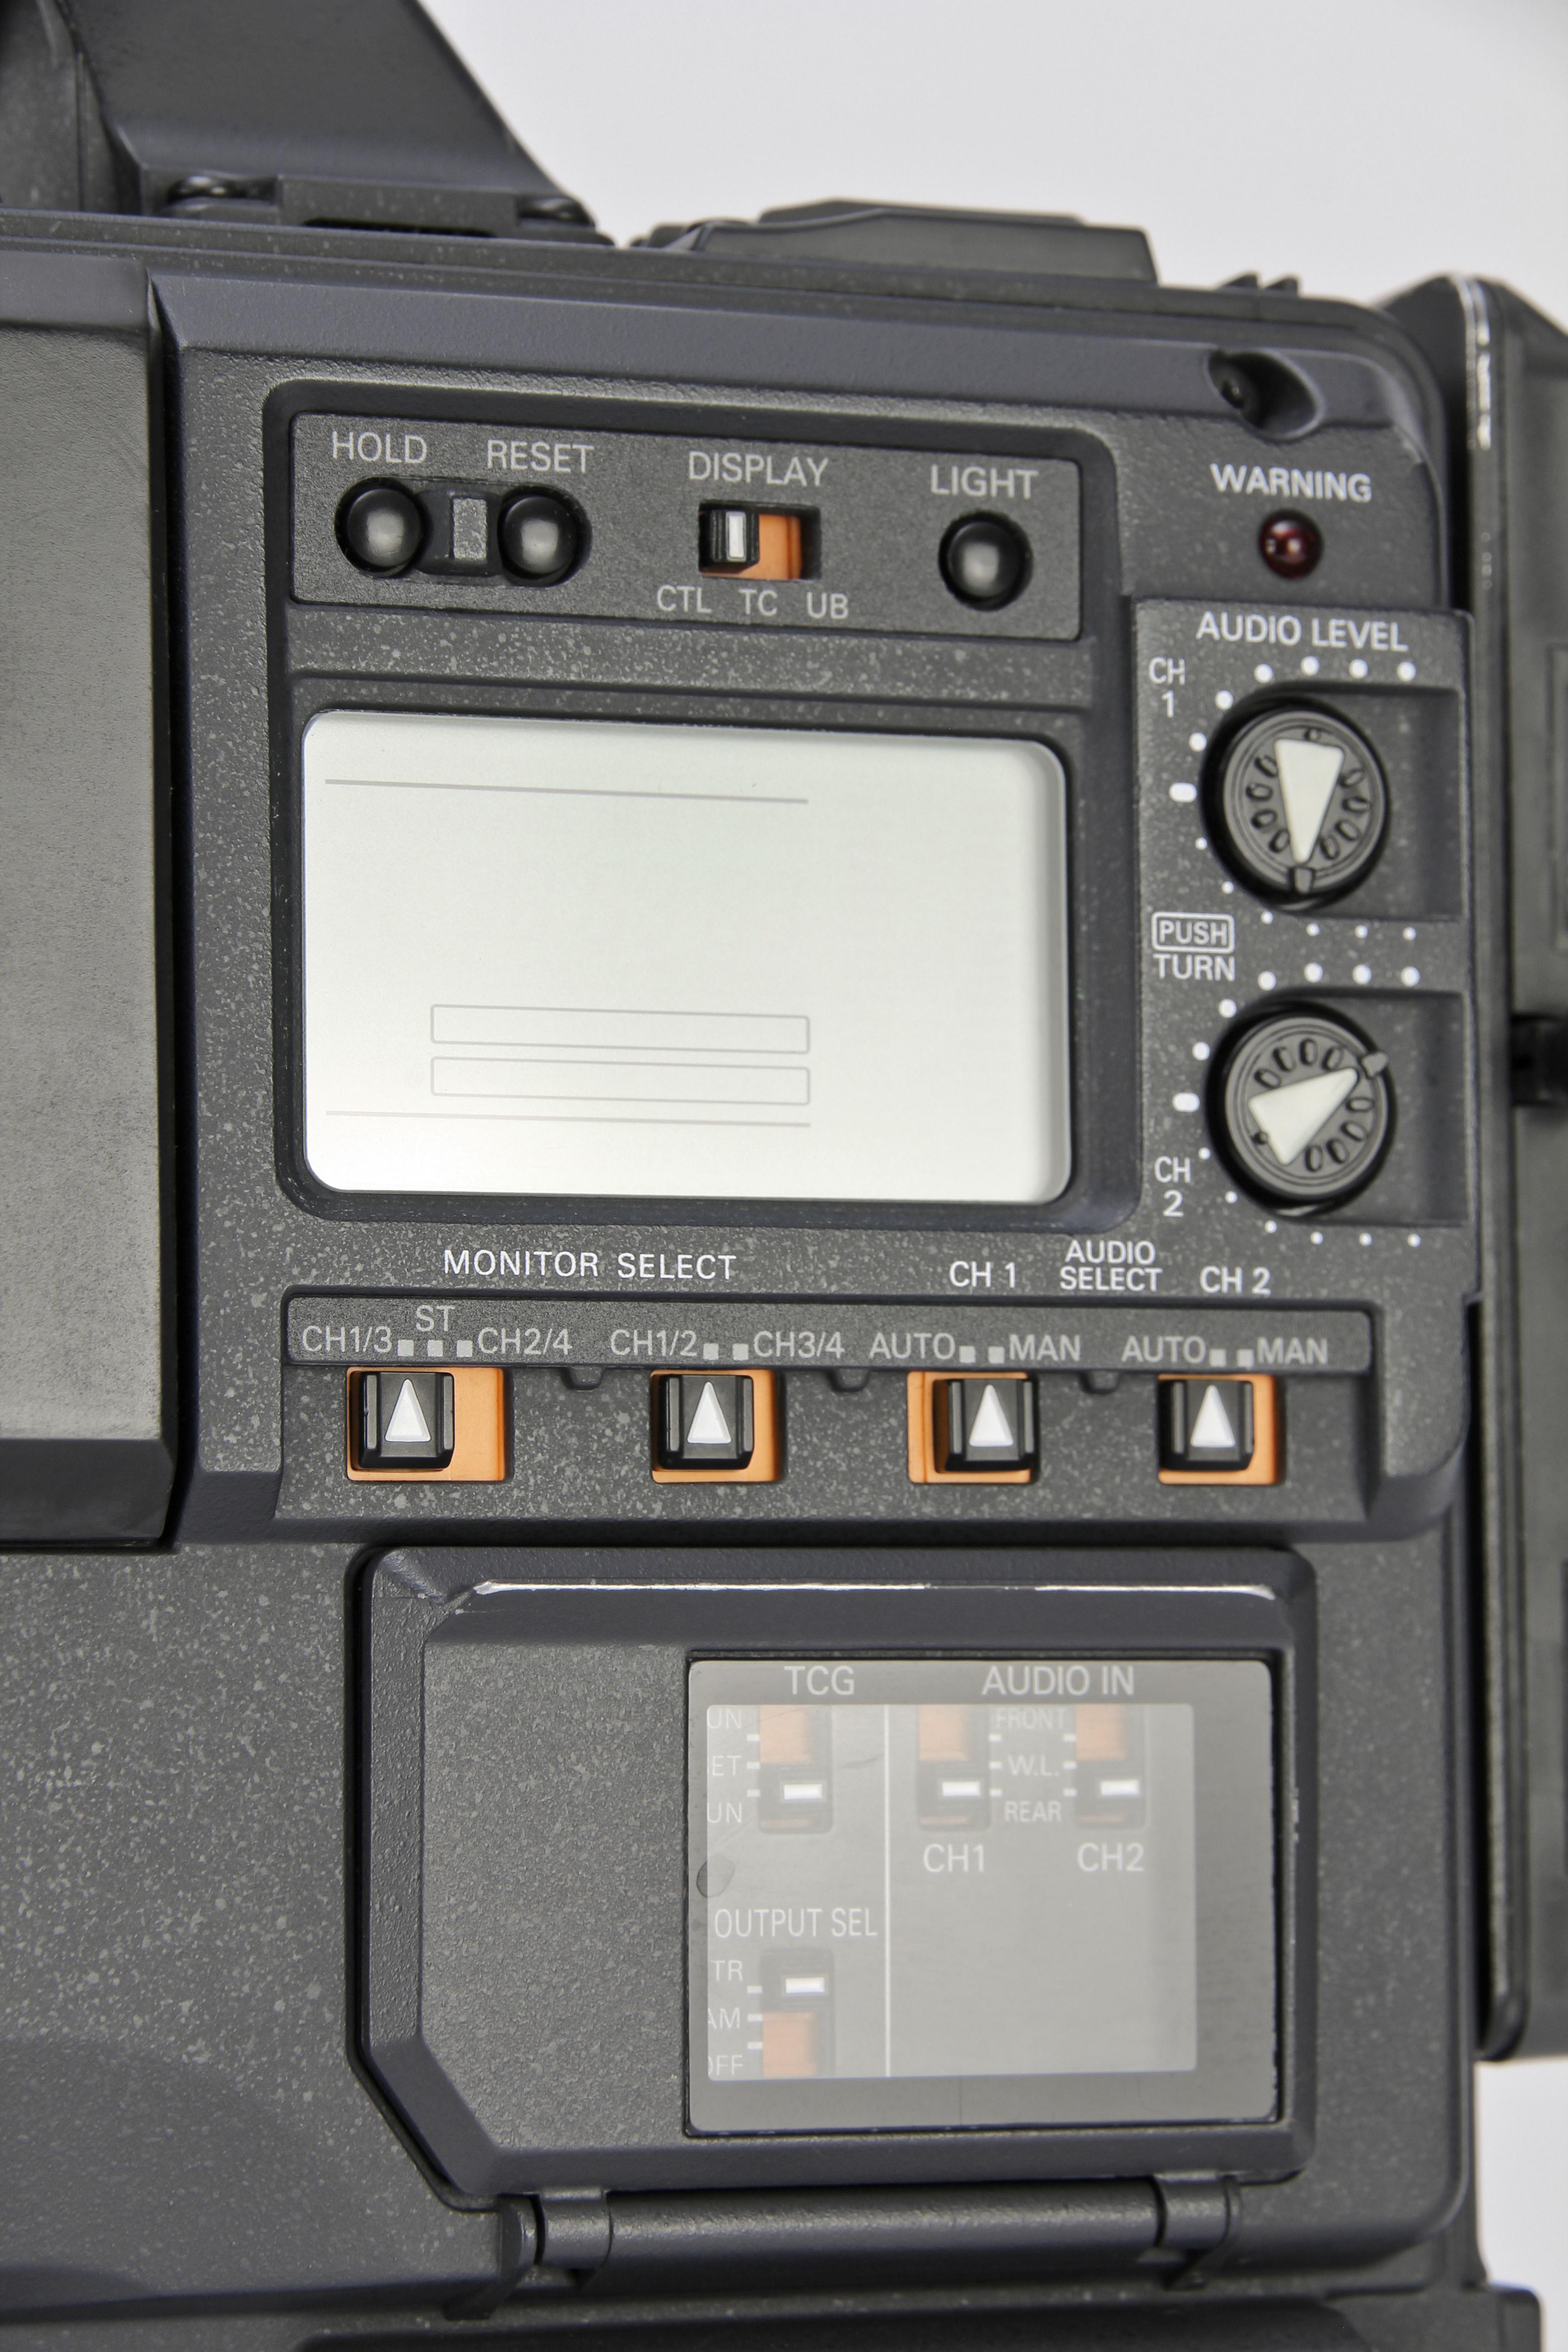 Panasonic AJ-SDC905E - 3